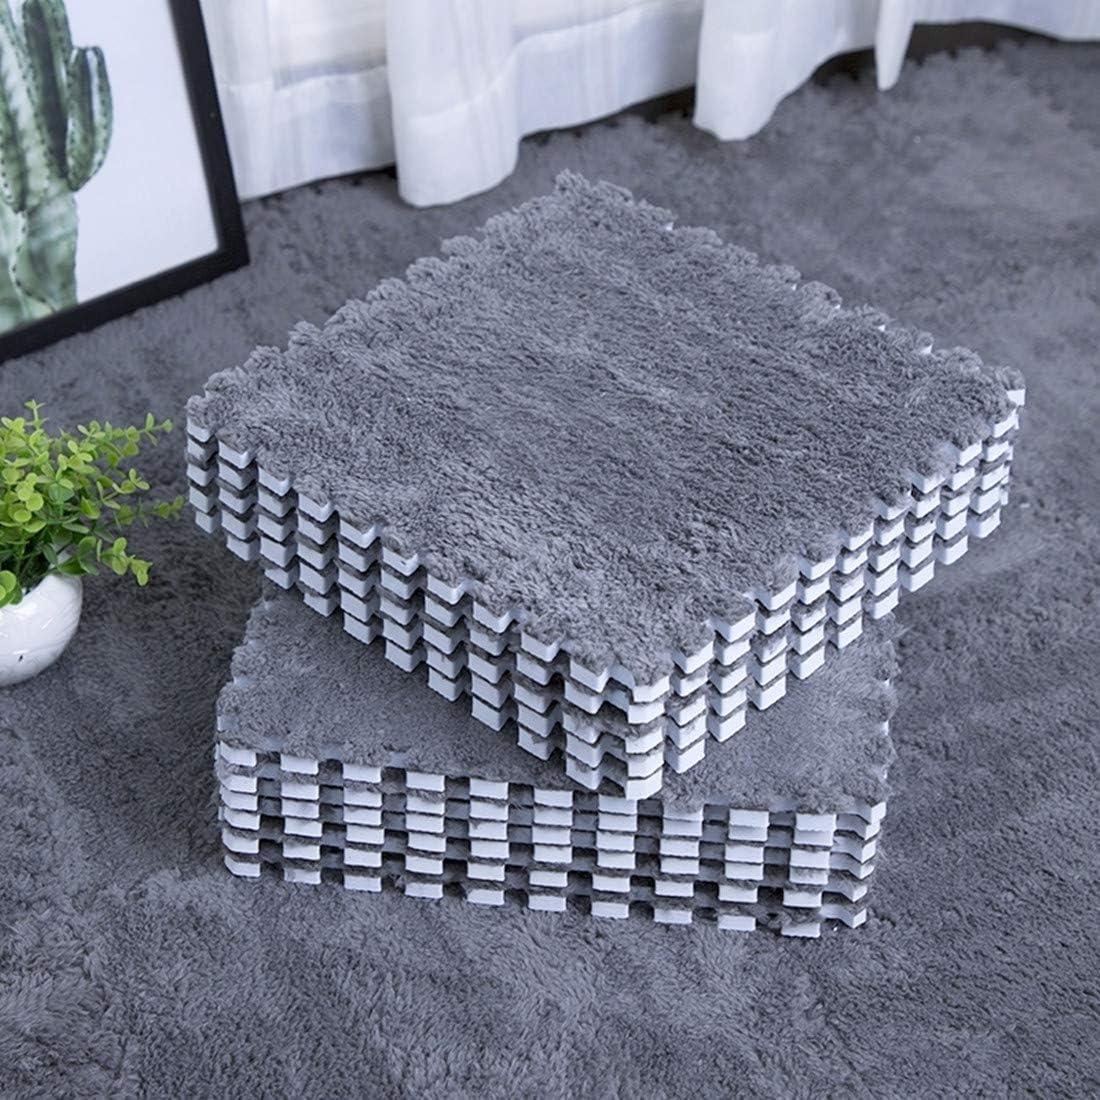 Translated Popular standard Smabee Interlocking Carpet Shaggy Soft Fluffy EVA Foam Area Mats